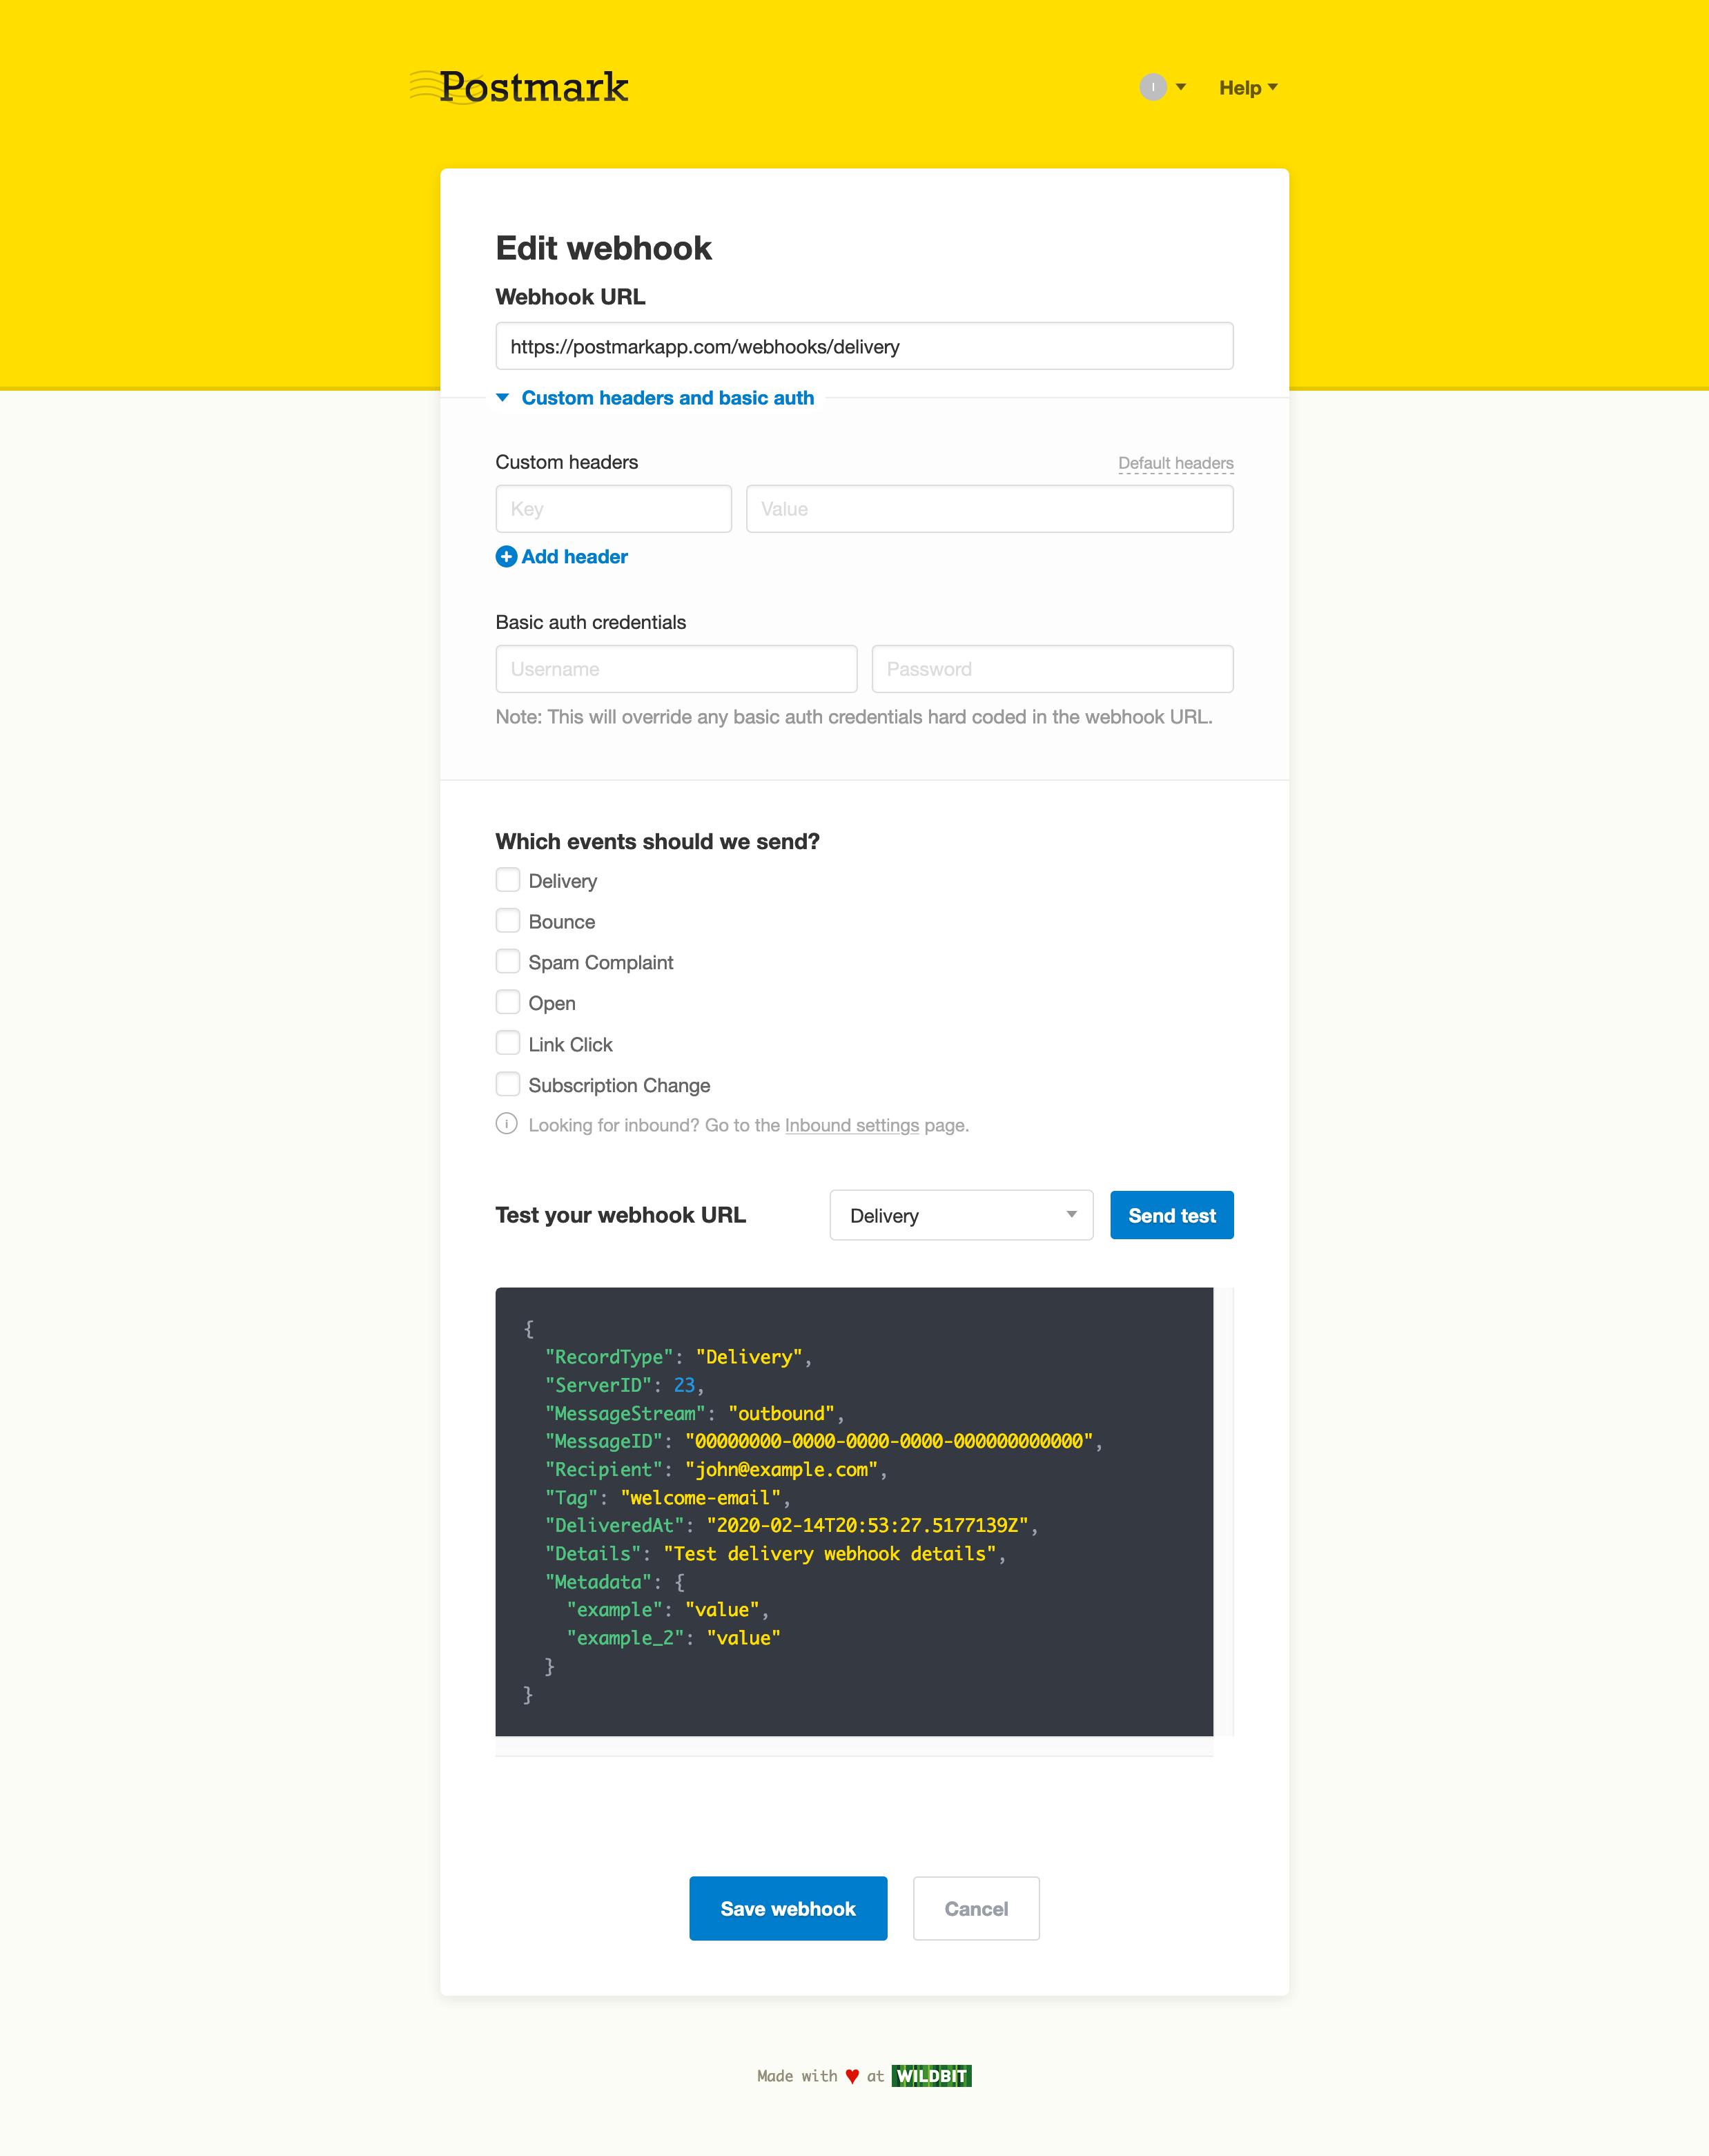 Edit webhook screen